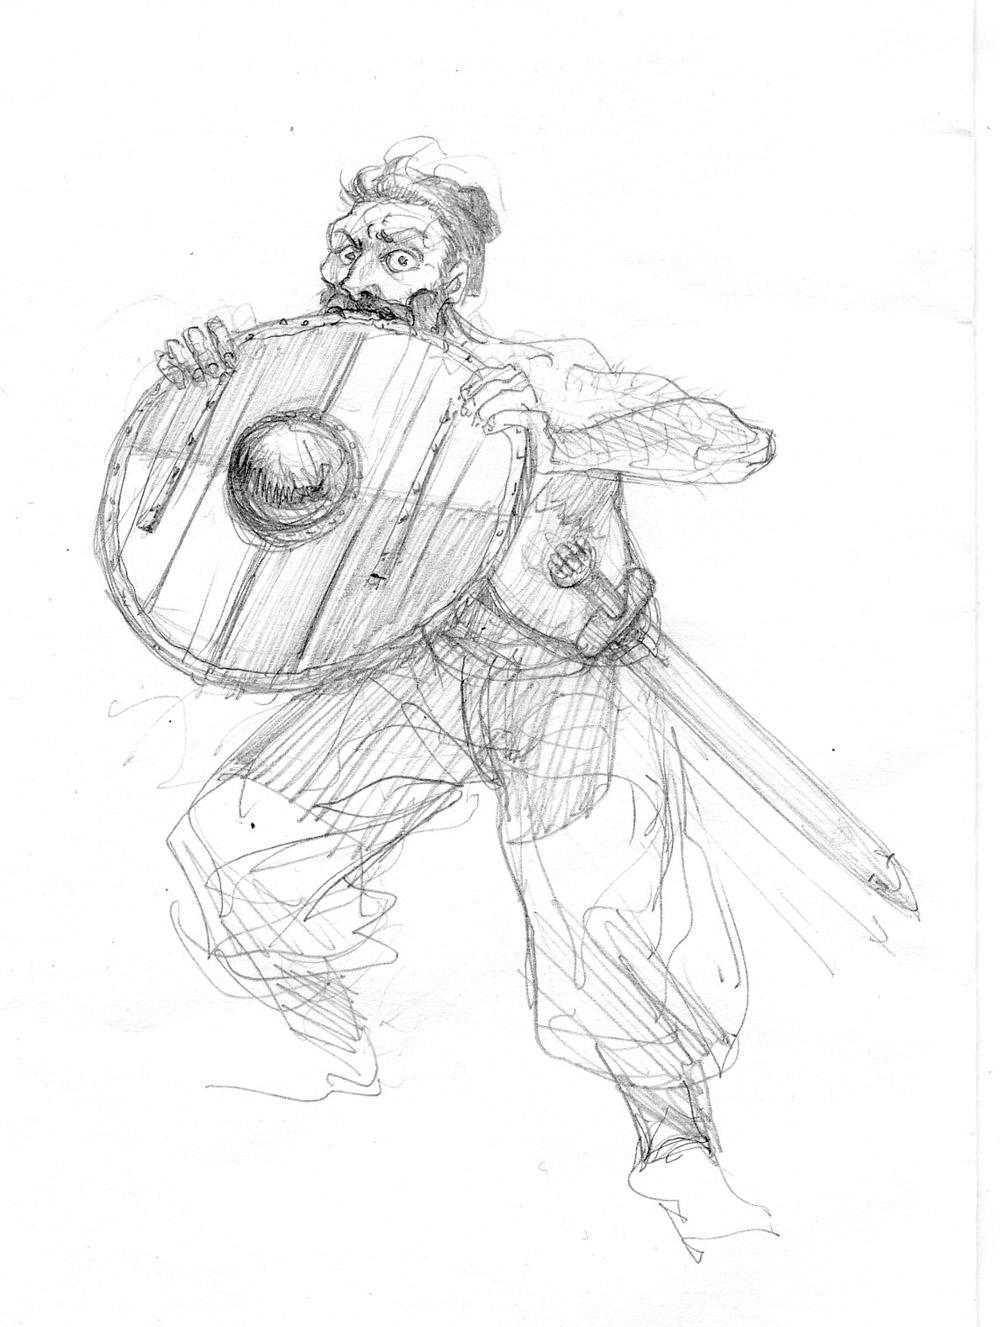 Sigurd & Vigdis, Sigurd Berserker © Benoît Blary